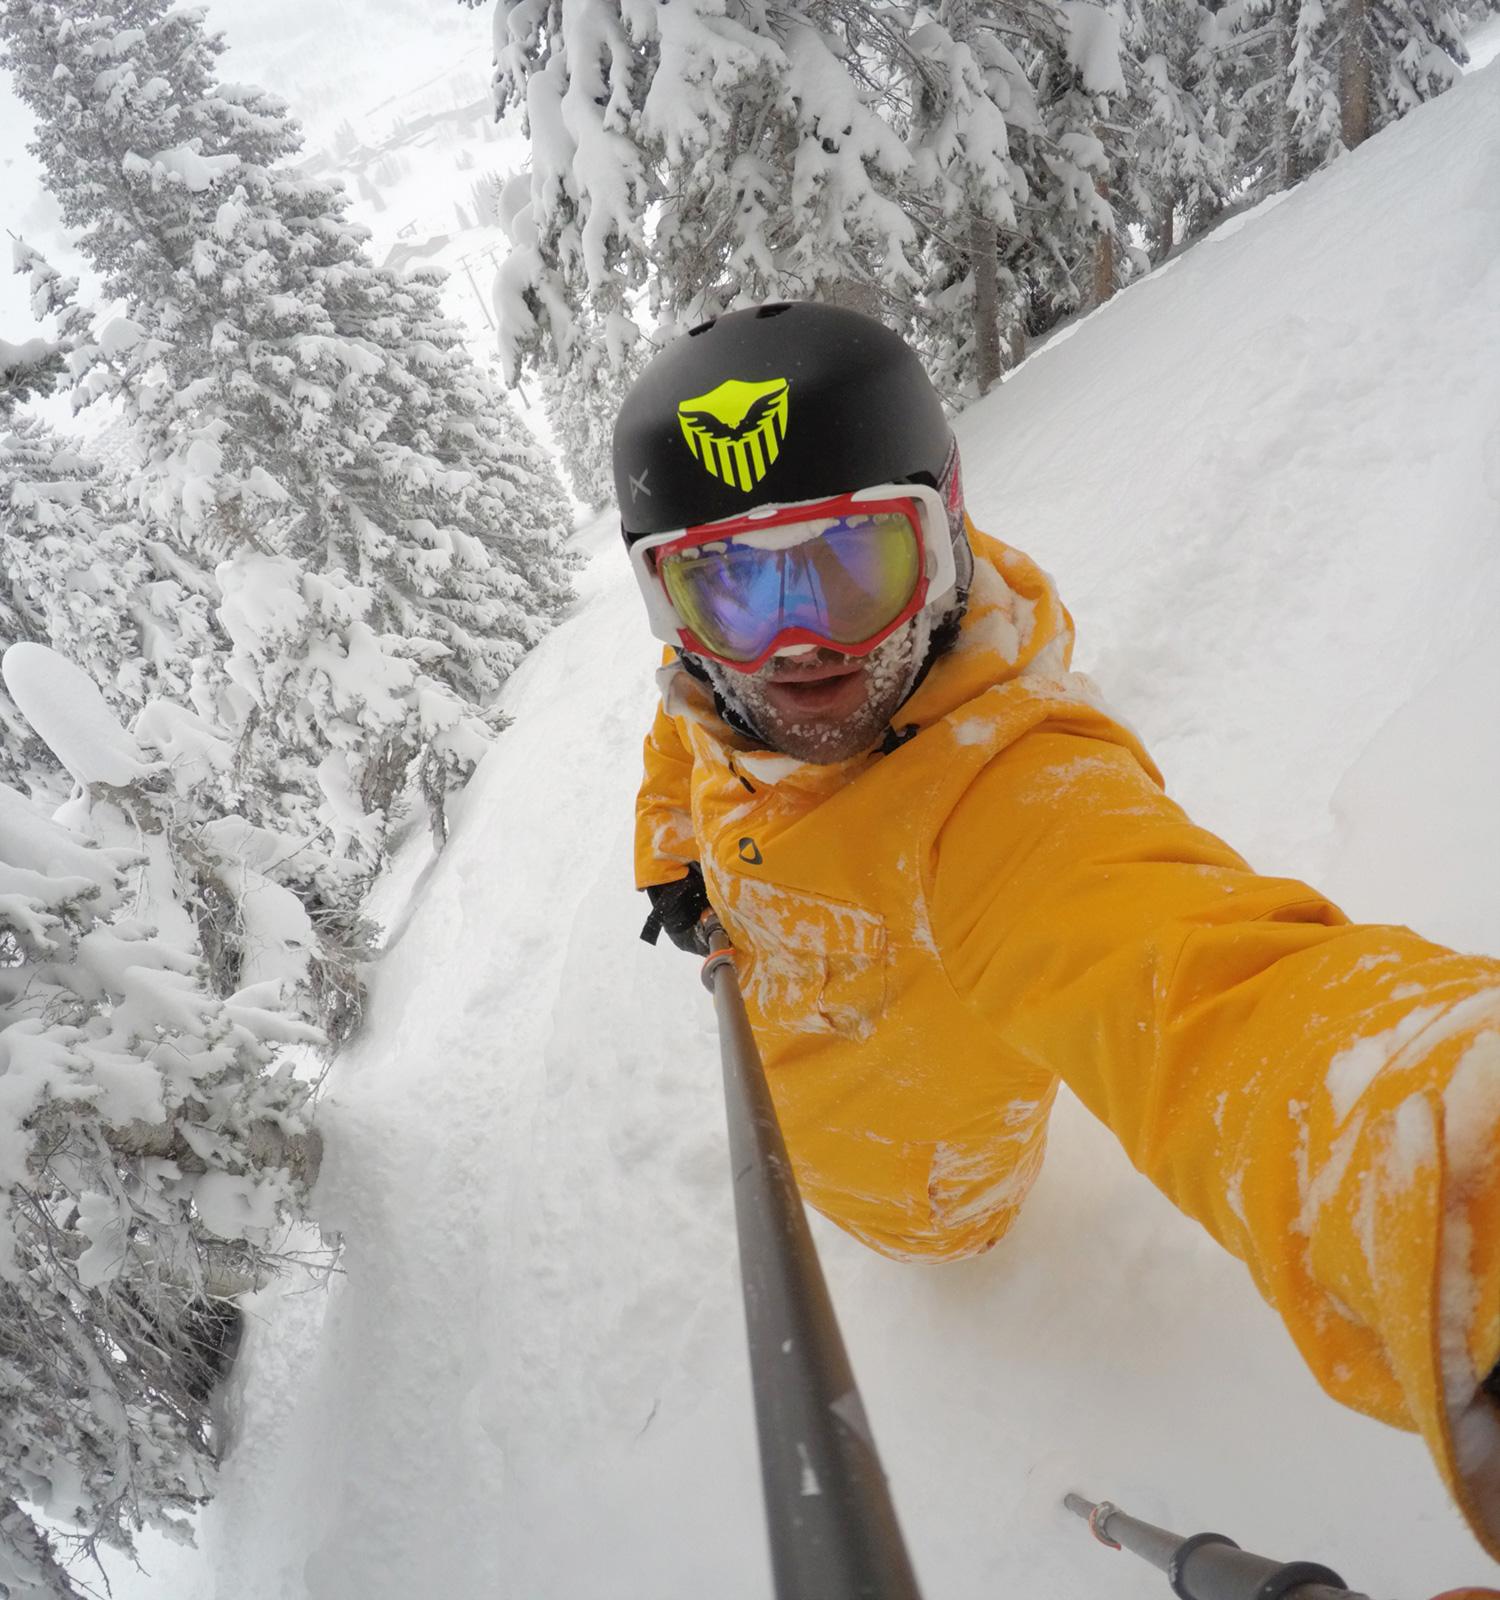 burke-alder-alta-ski-resort-powder-trees-picture.jpg